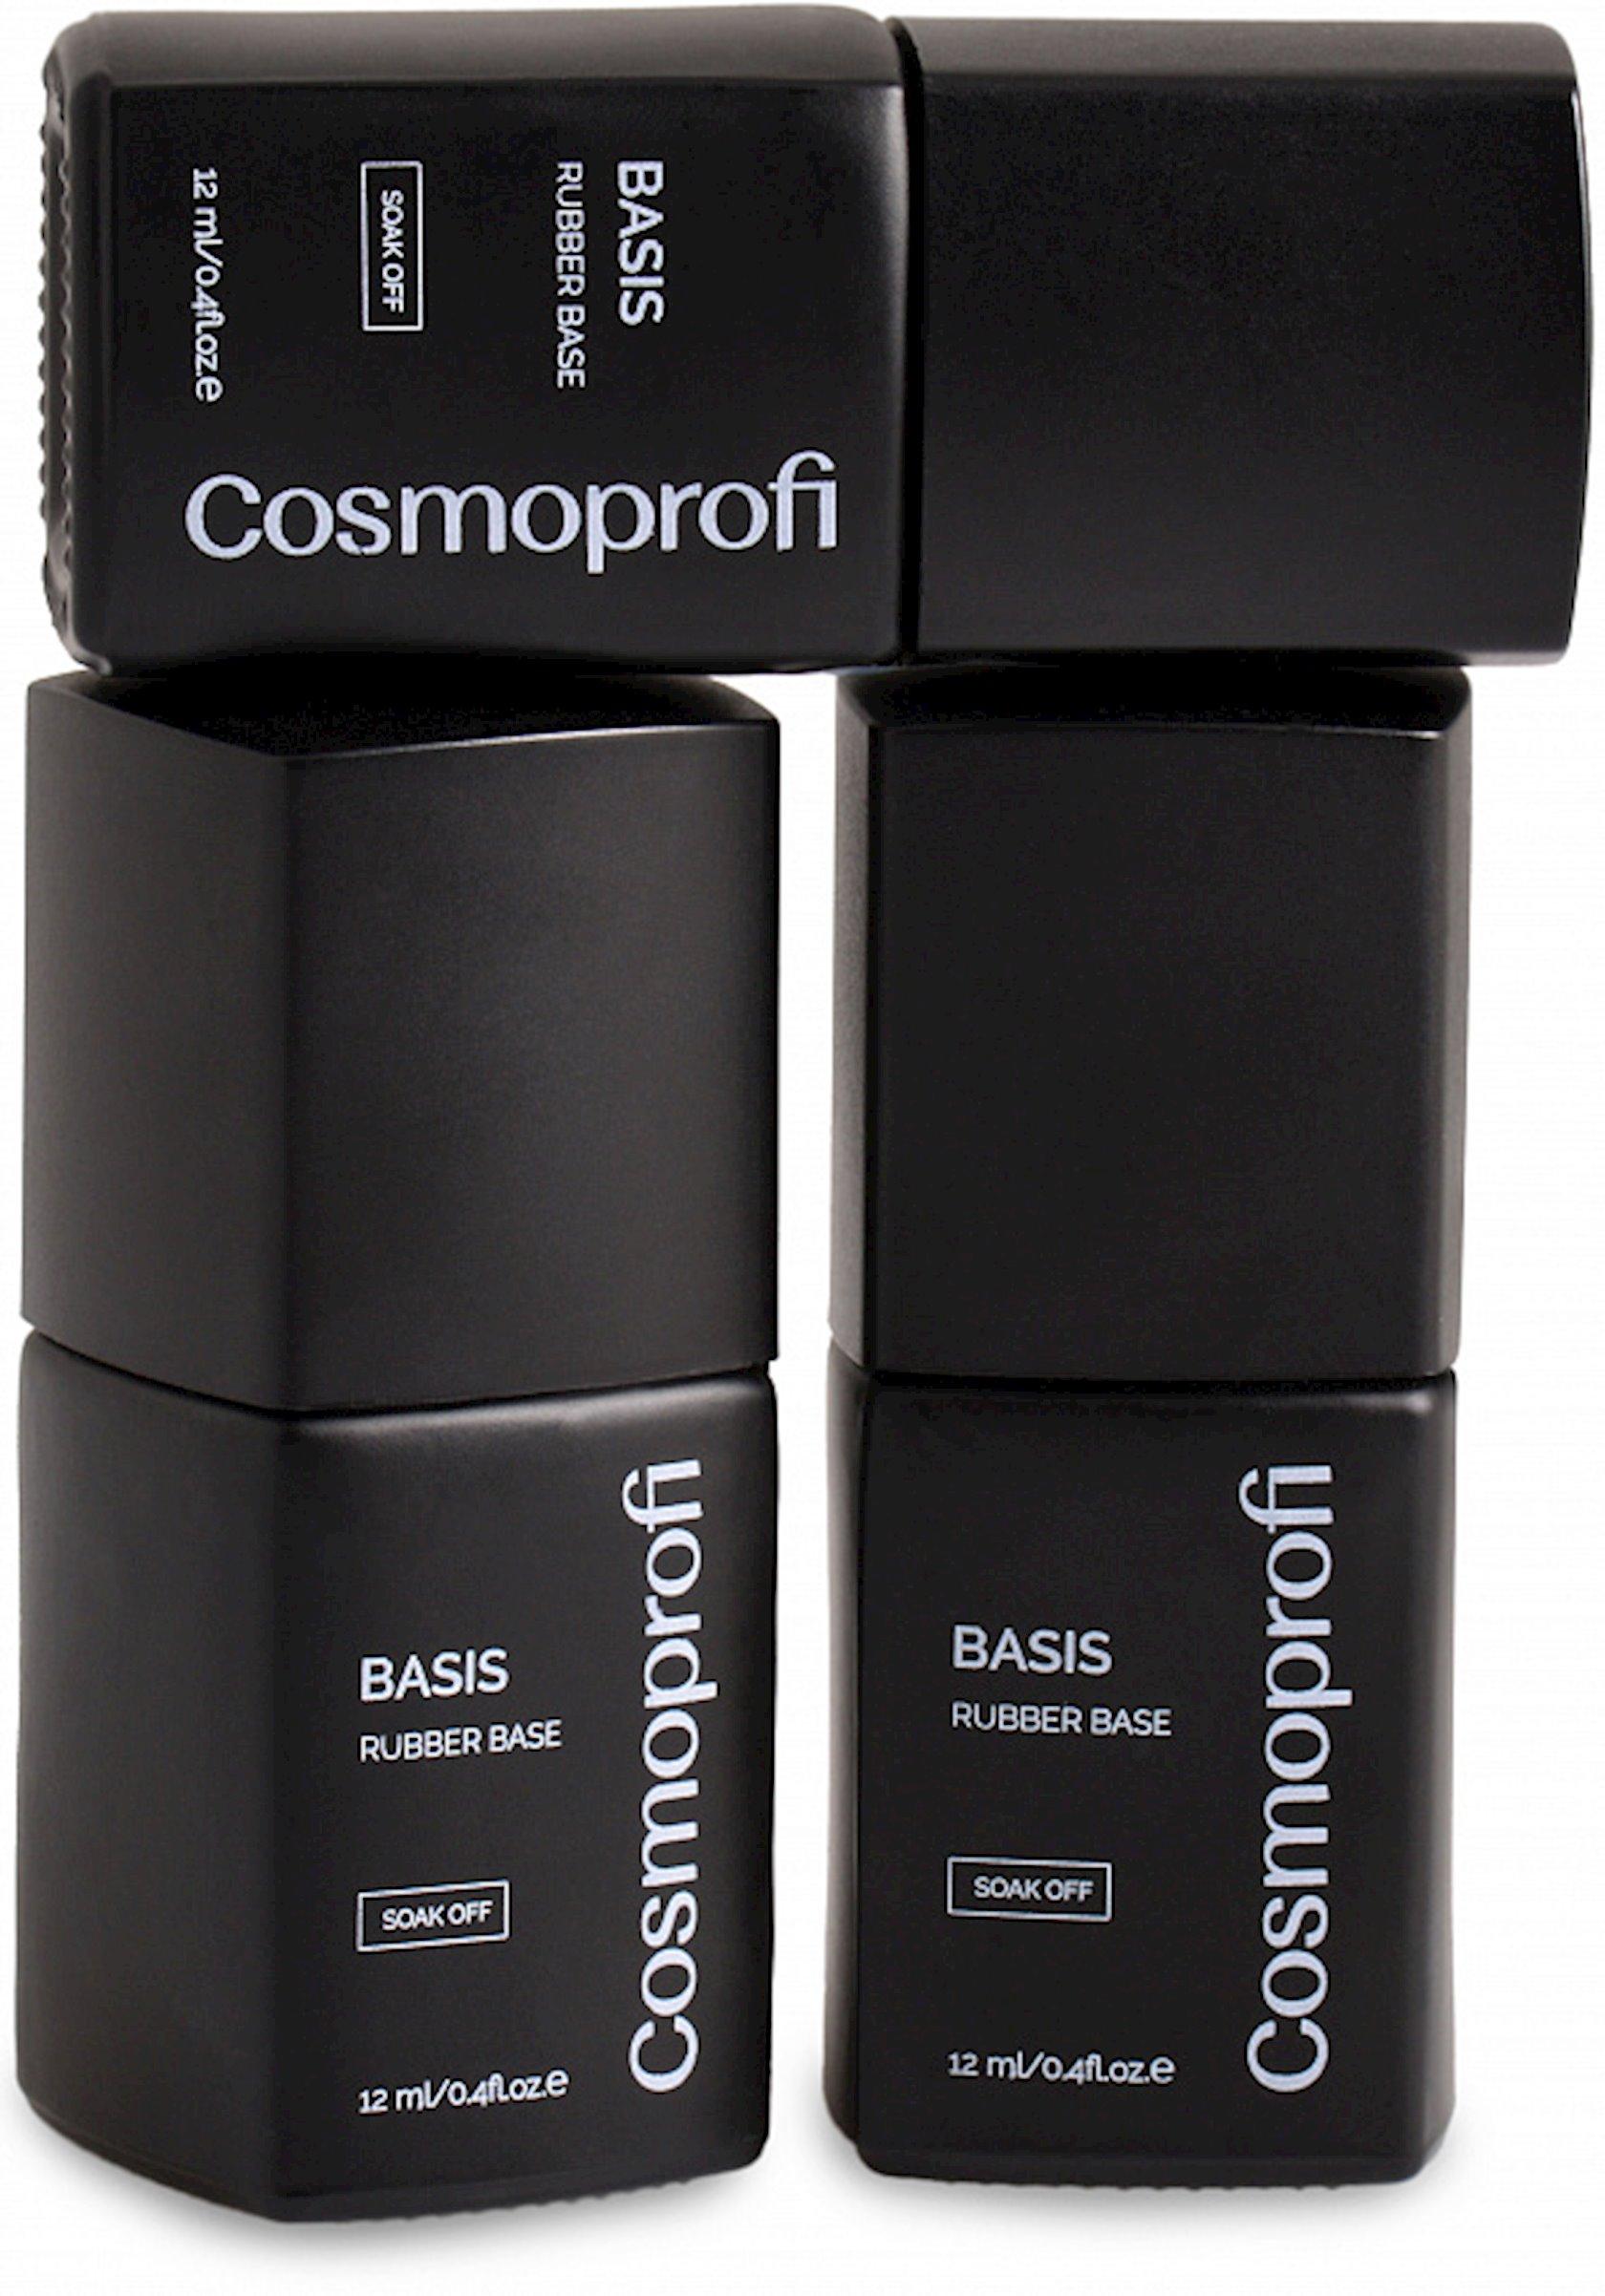 Baza geli Cosmoprofi Basis, 12 ml